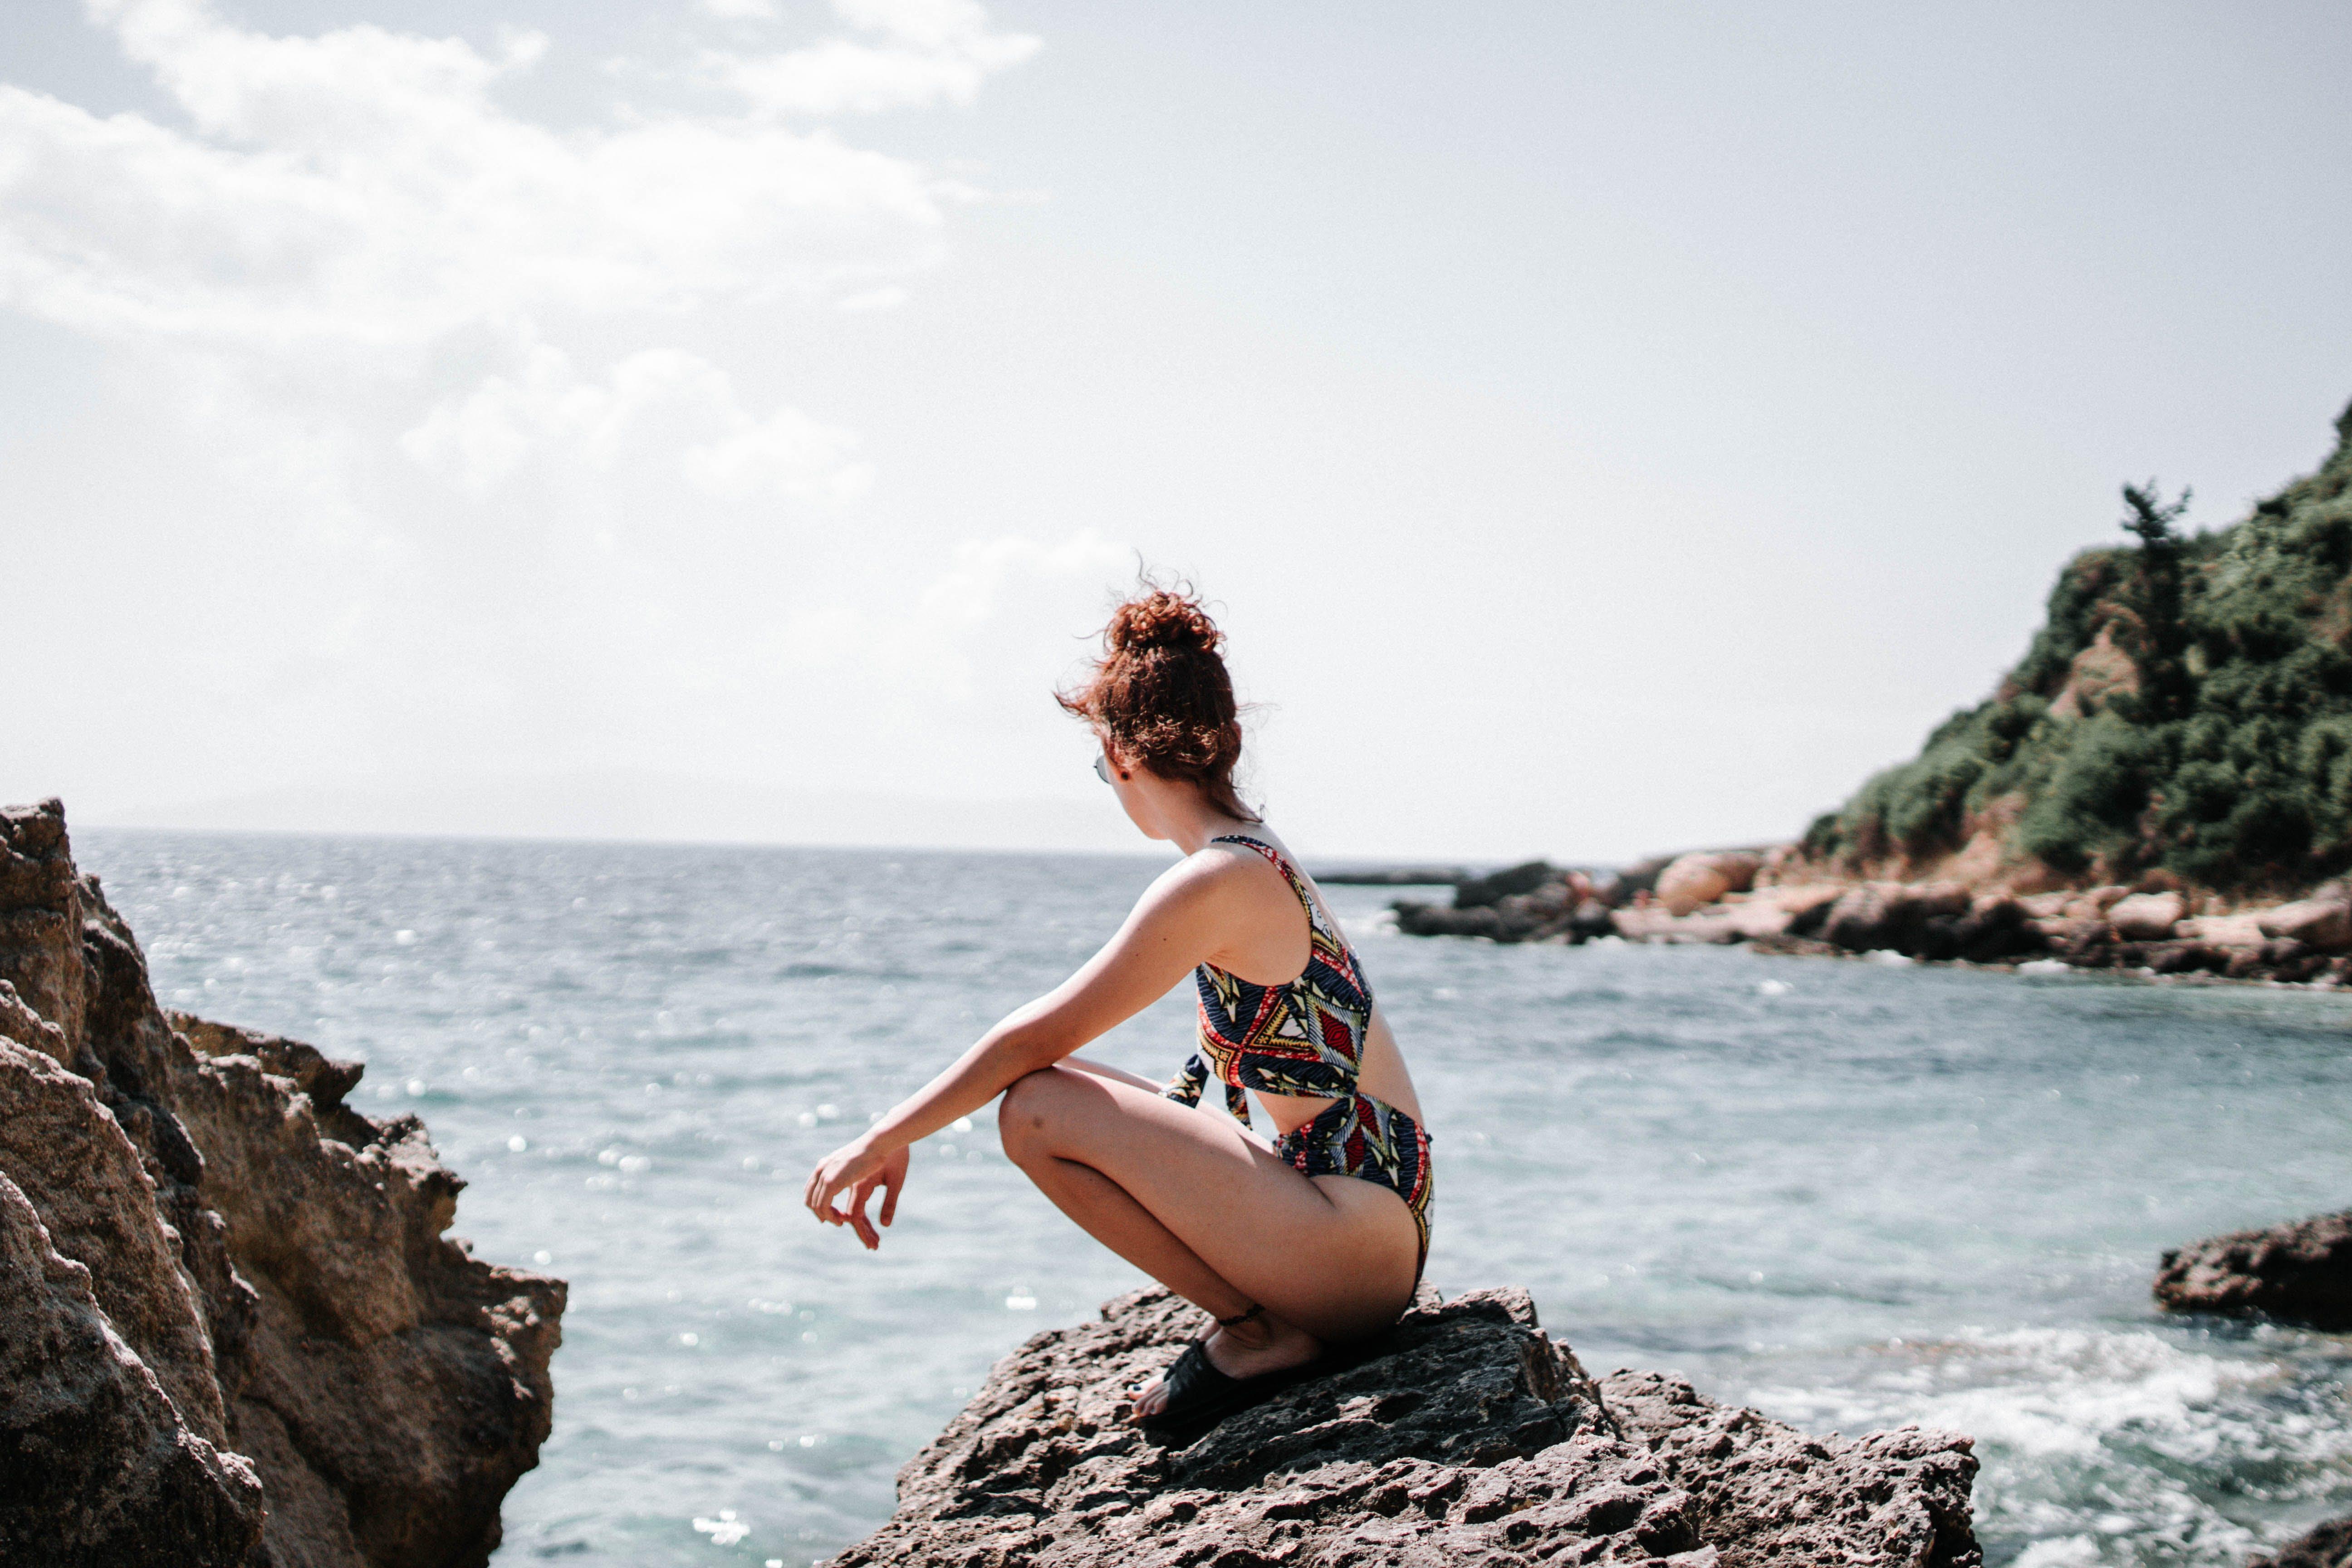 Woman in Swim Suit Sitting on a Rock